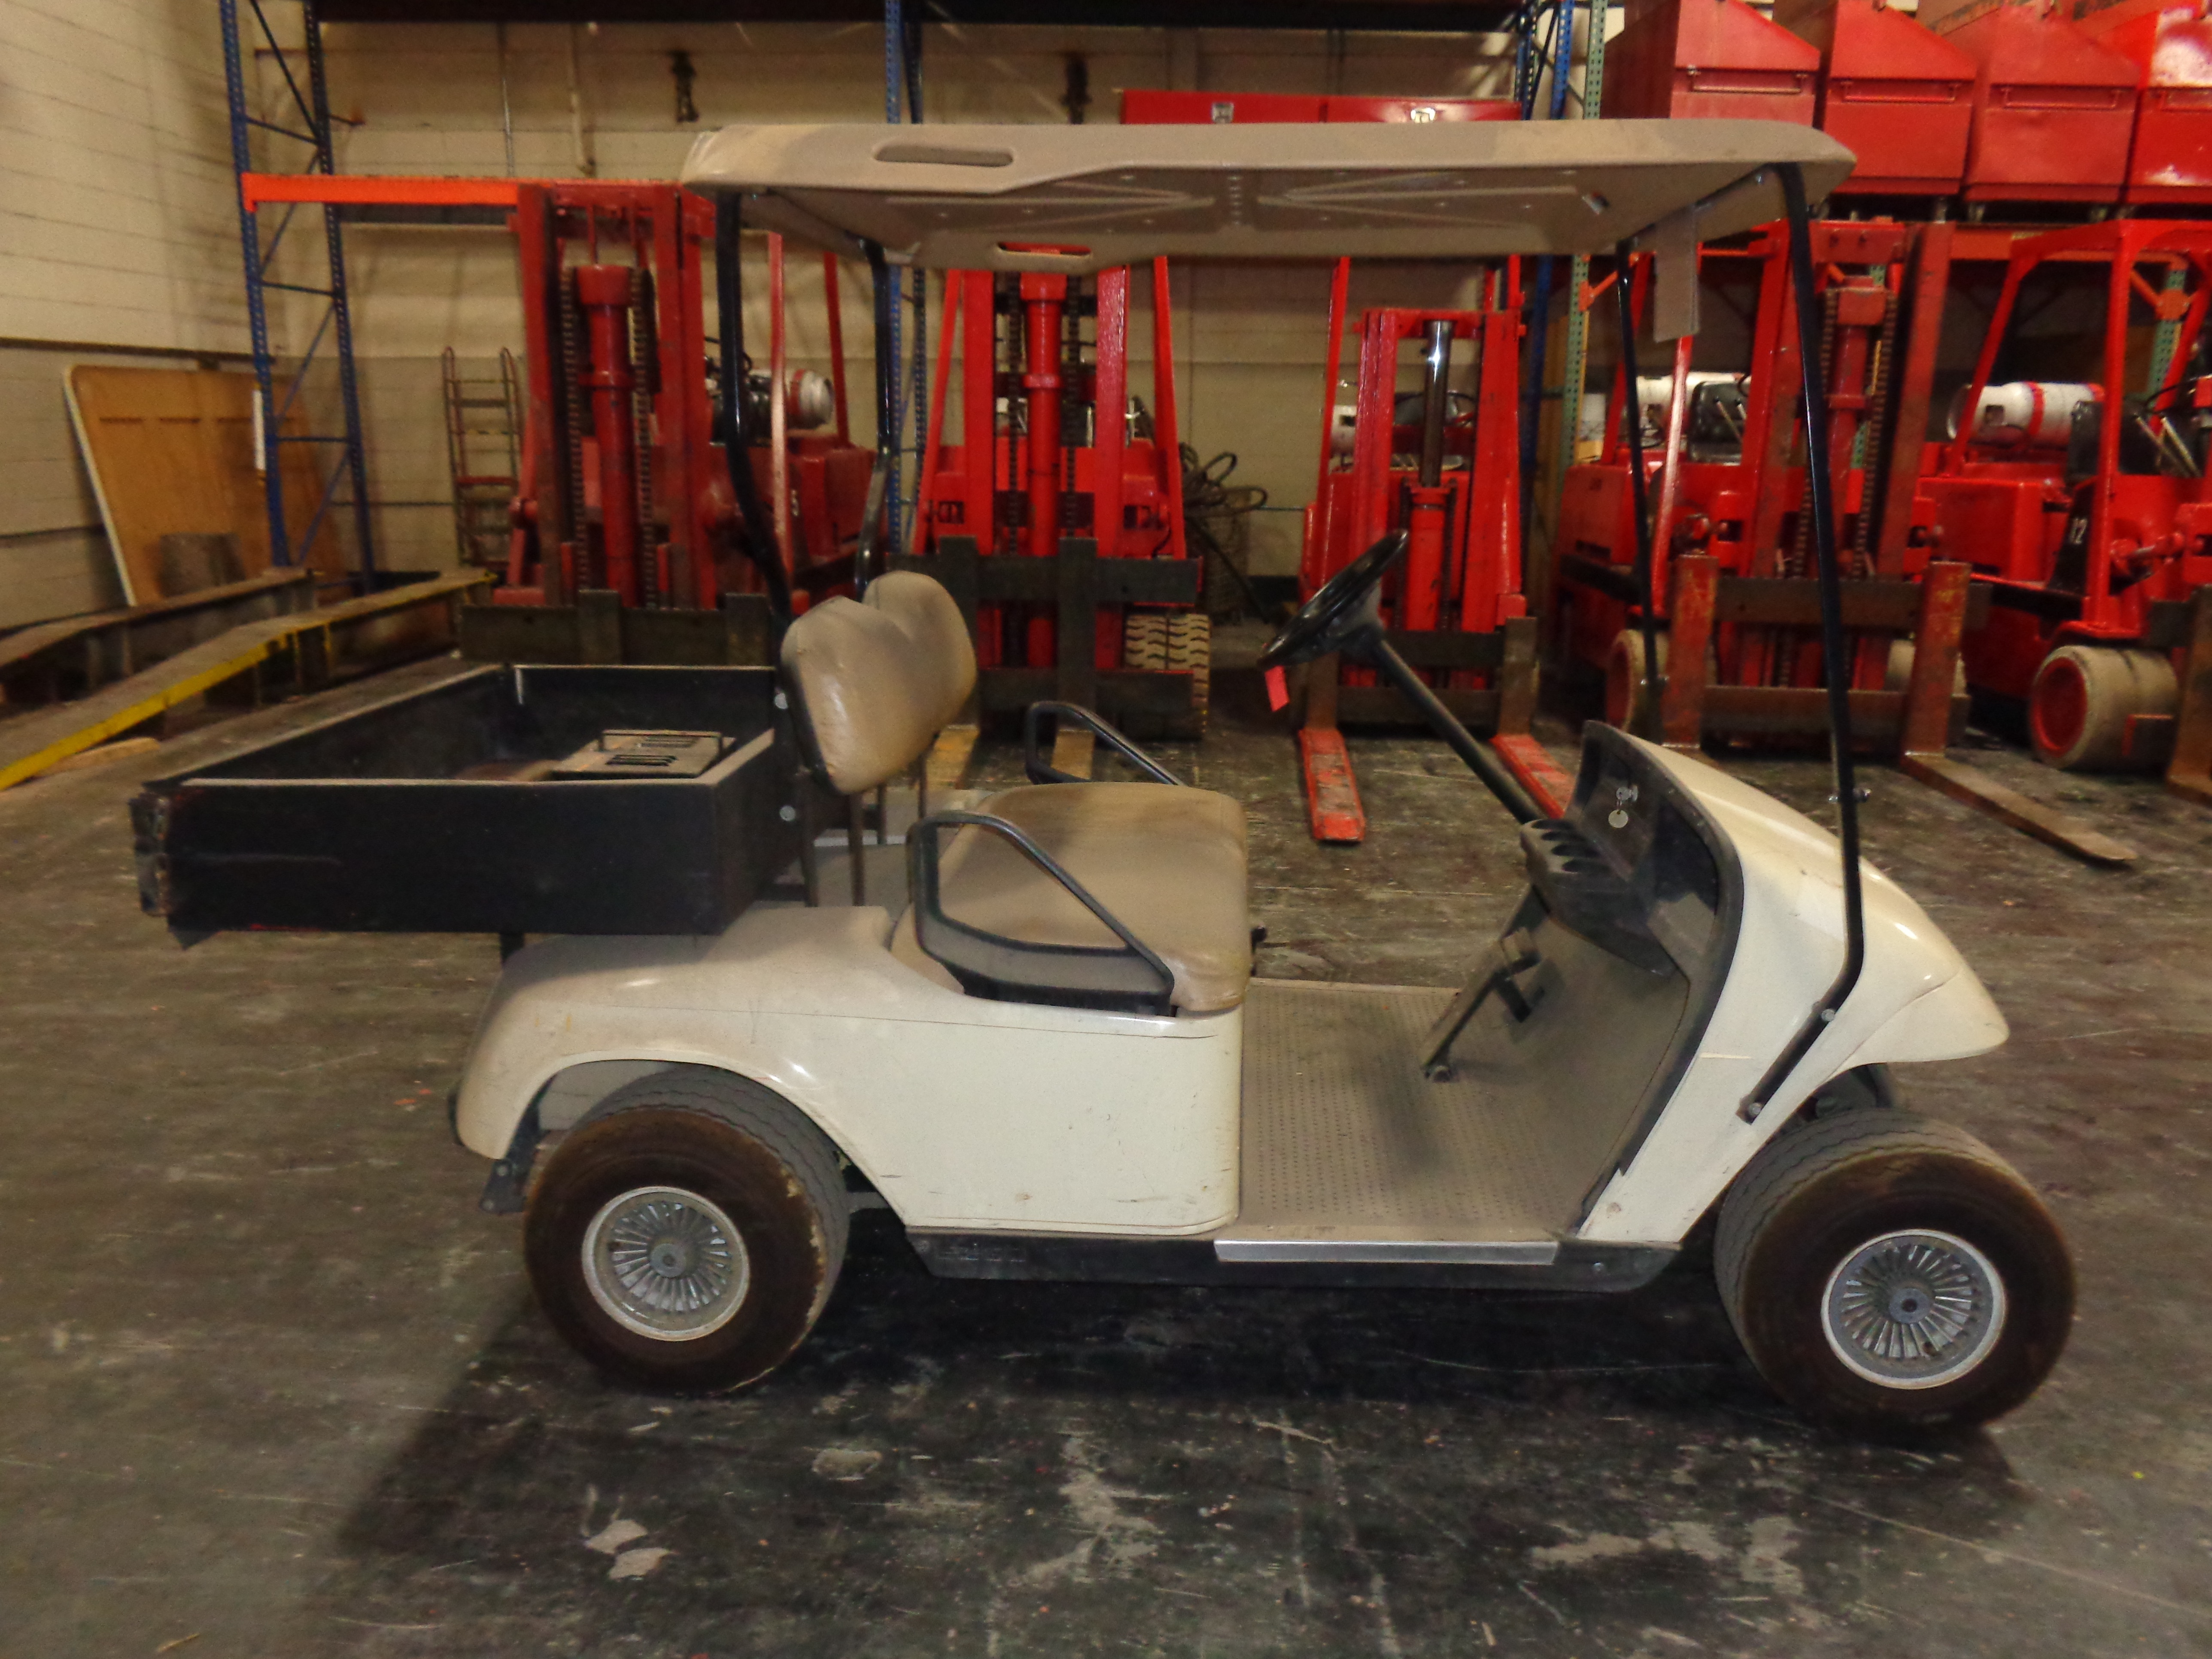 2004 EZGO Golf Cart - Image 3 of 4